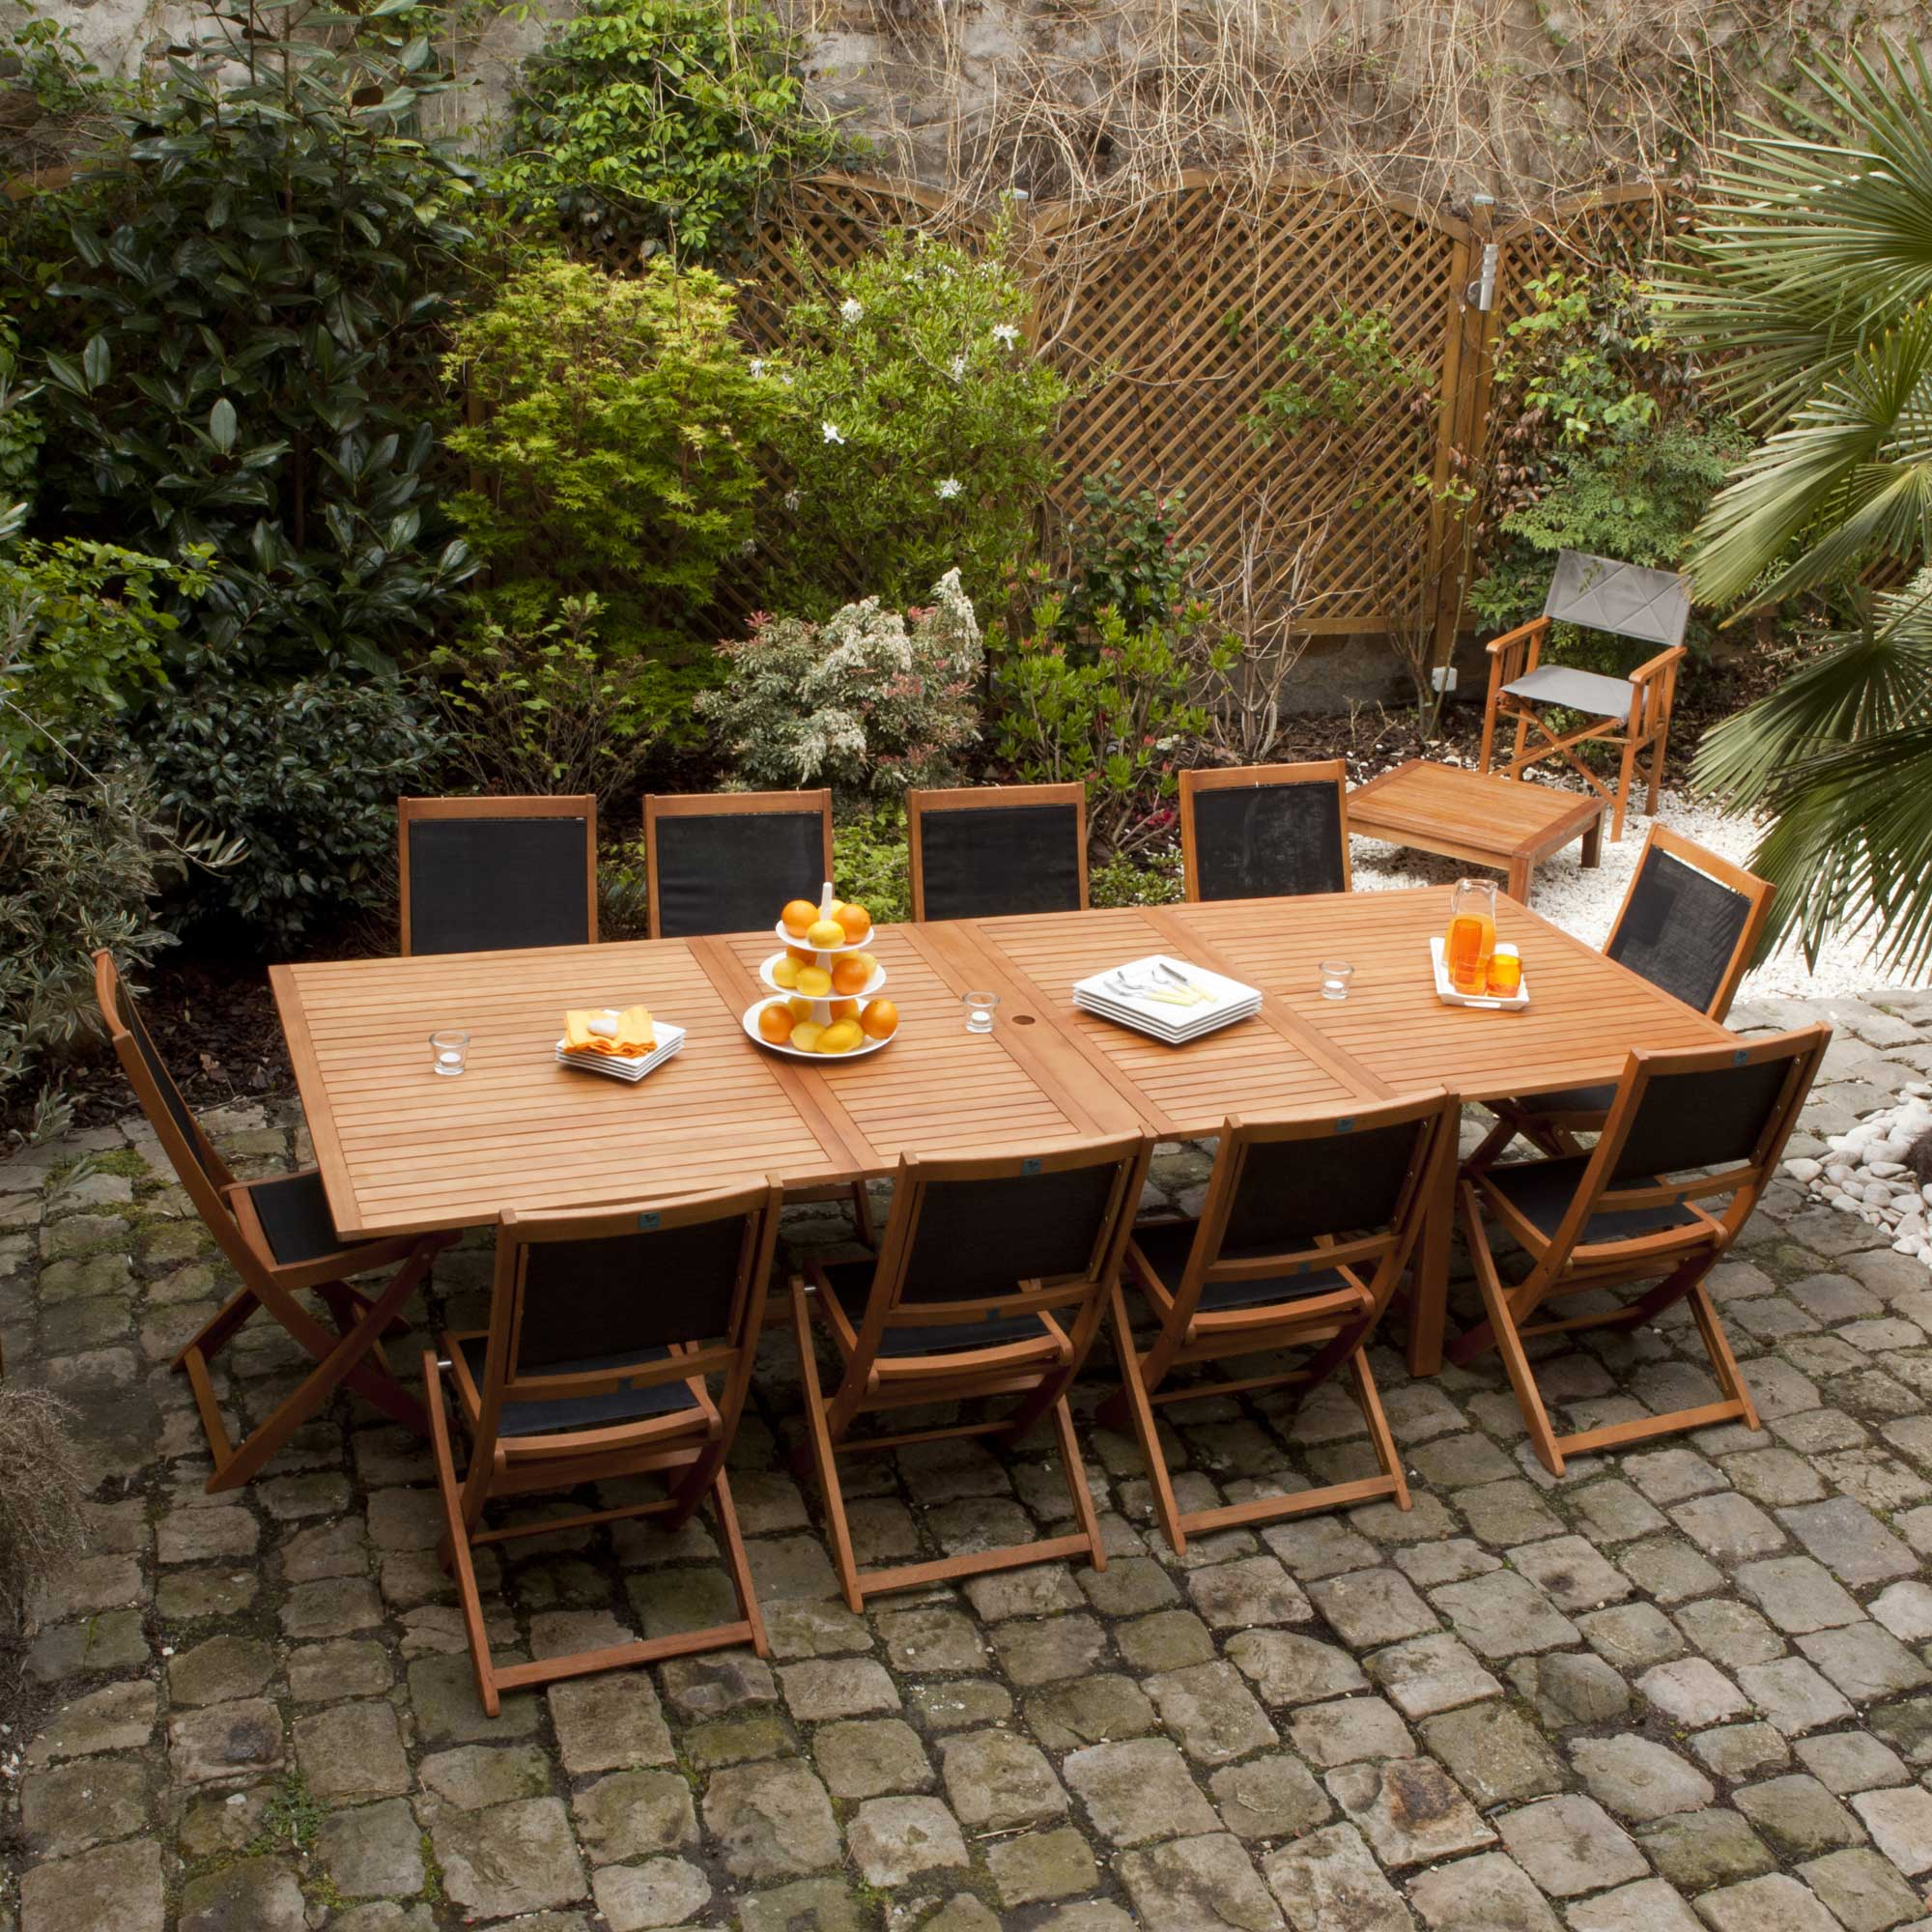 Salon de jardin table et chaises leclerc - Mailleraye.fr jardin